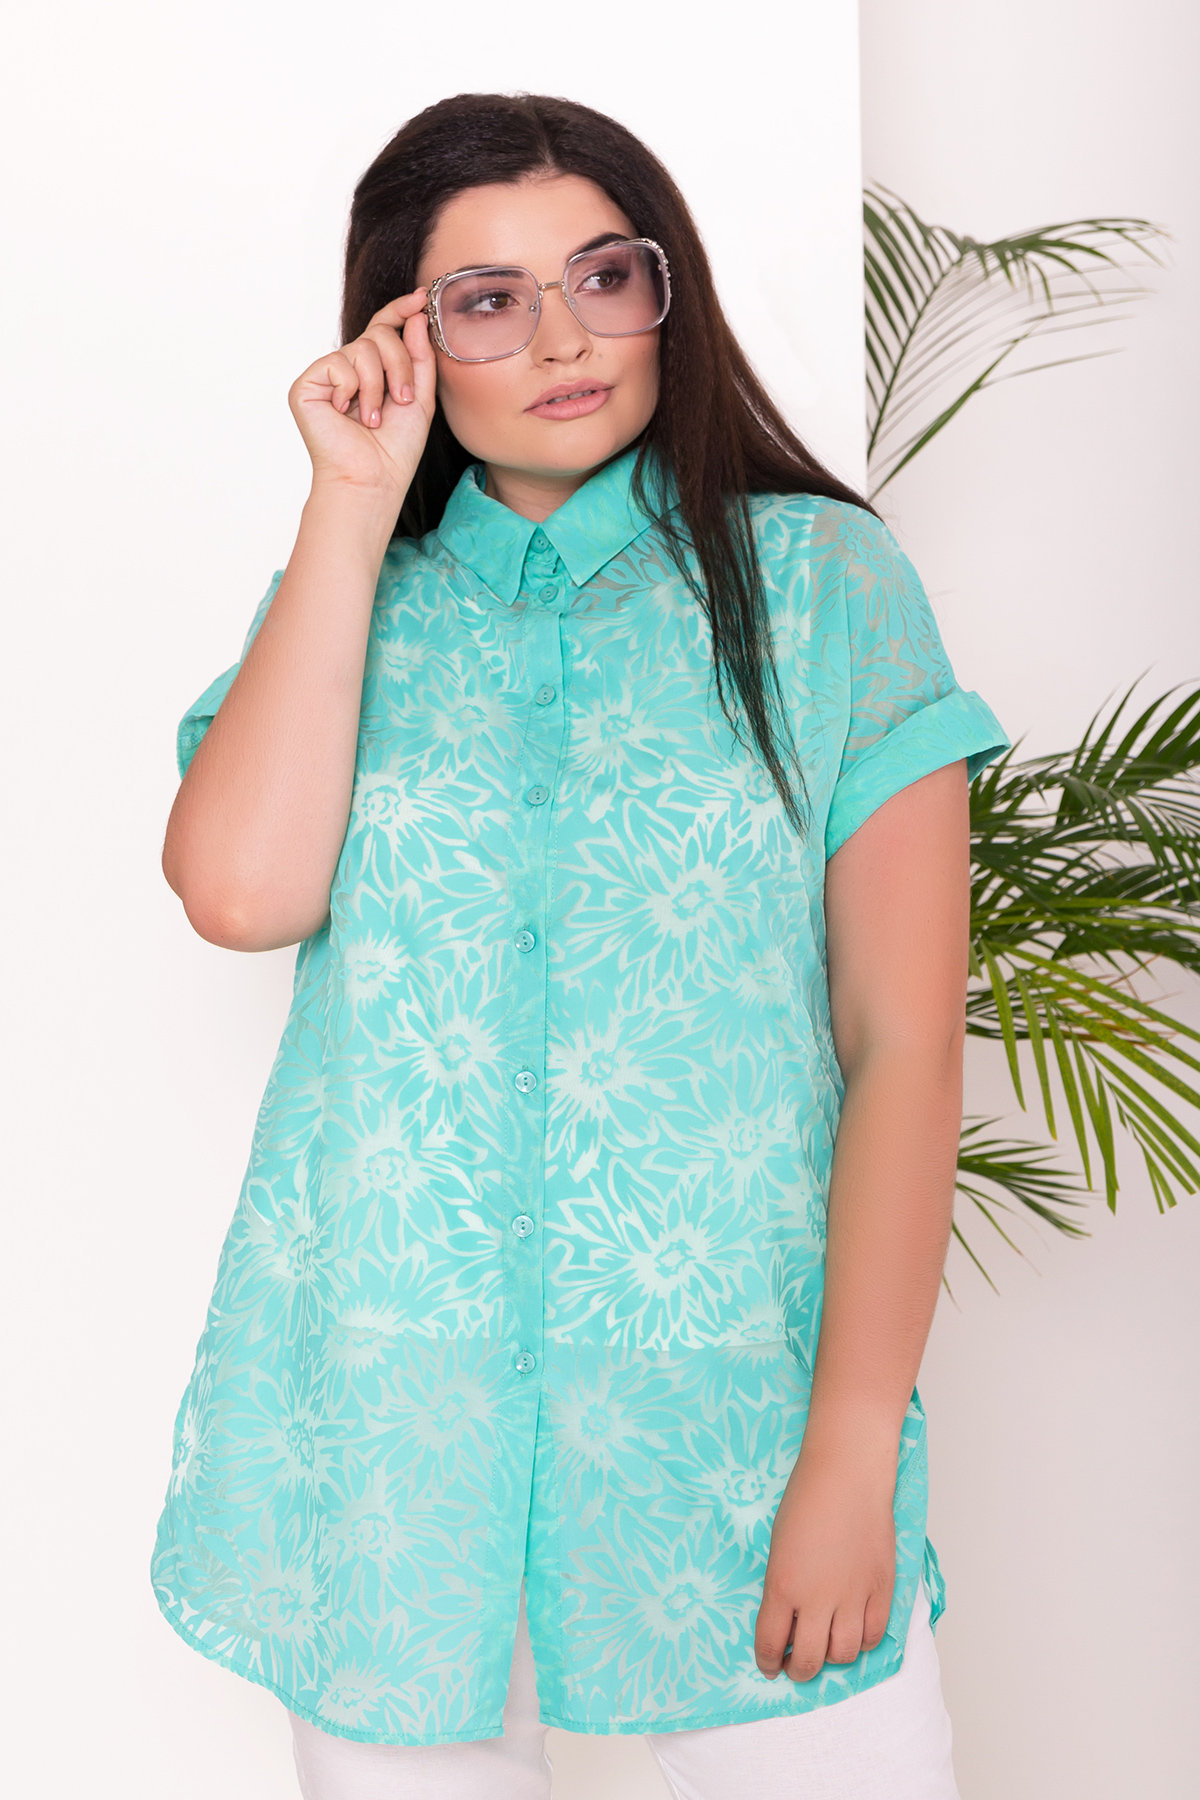 Комплект рубашка   майка  Аланья Donna 7579 АРТ. 43512 Цвет: Мята - фото 2, интернет магазин tm-modus.ru